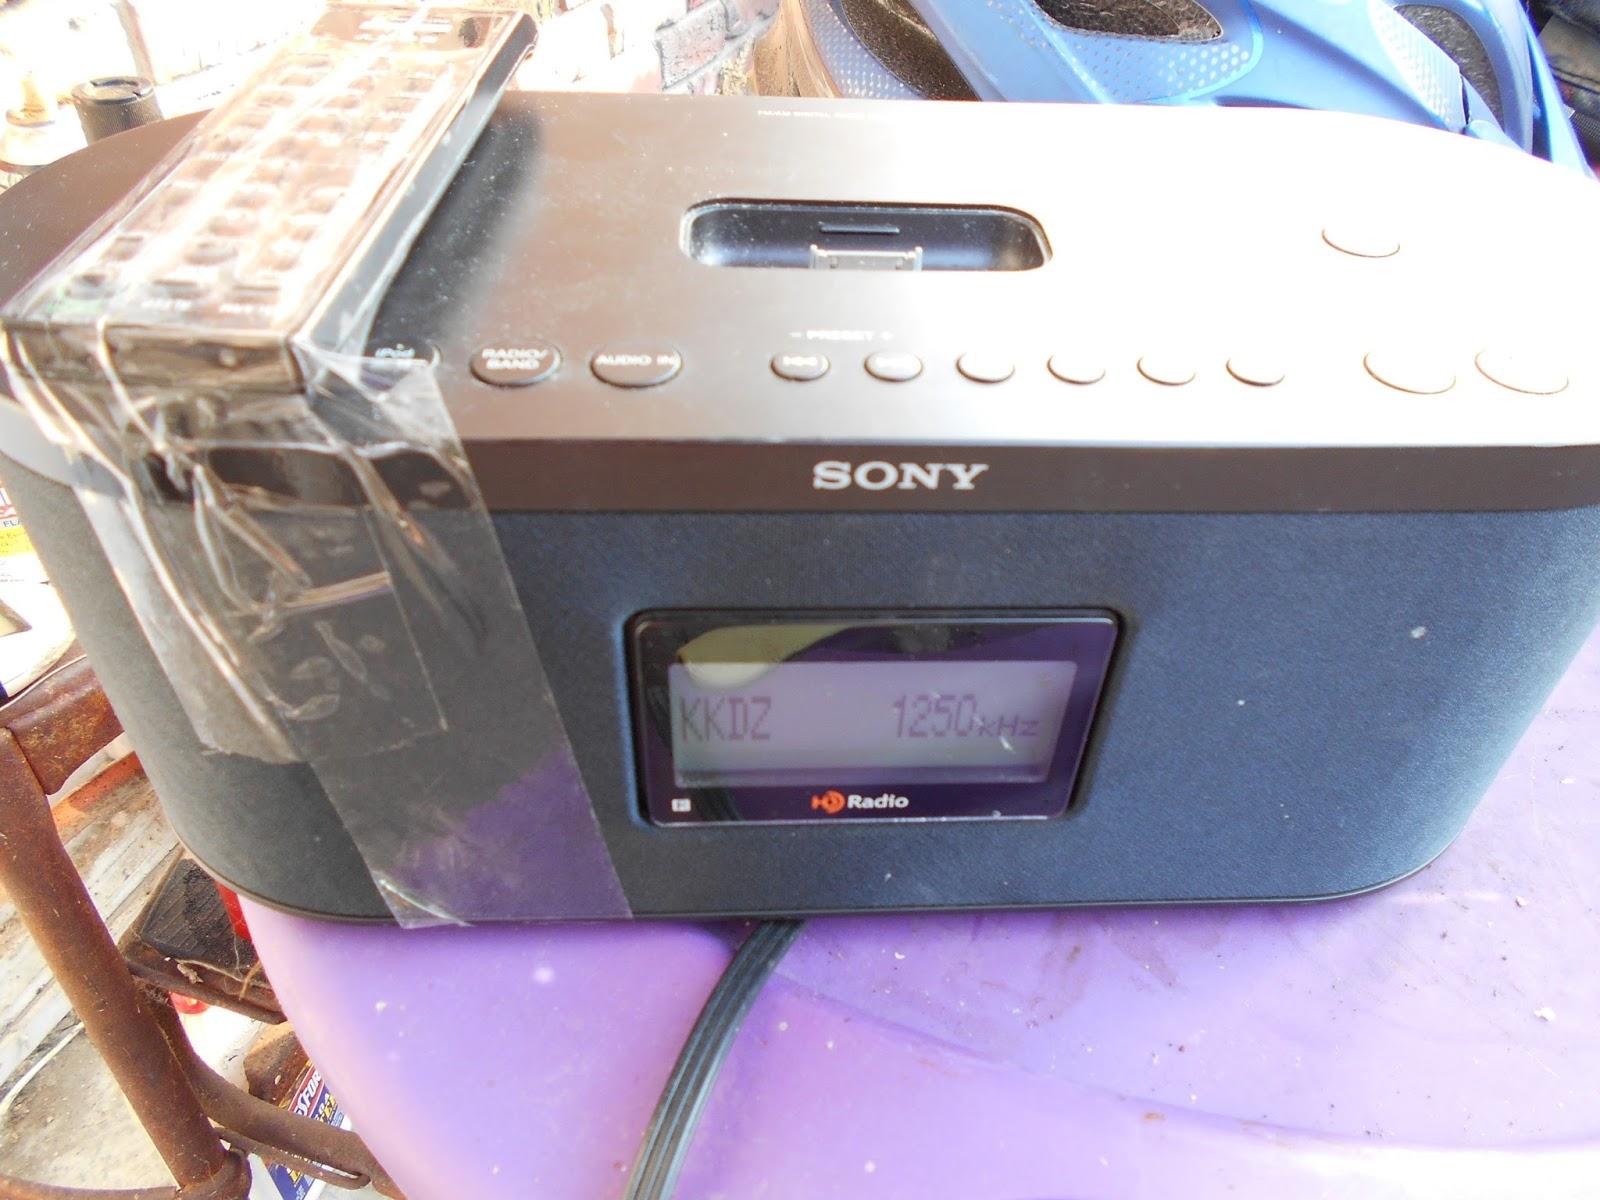 interrock nation a sony xdr s10hdip hd radio new thrift store find rh interrocknation blogspot com Sony Stereo with iPod Dock Sony XDR-S10HDiP HD Radio